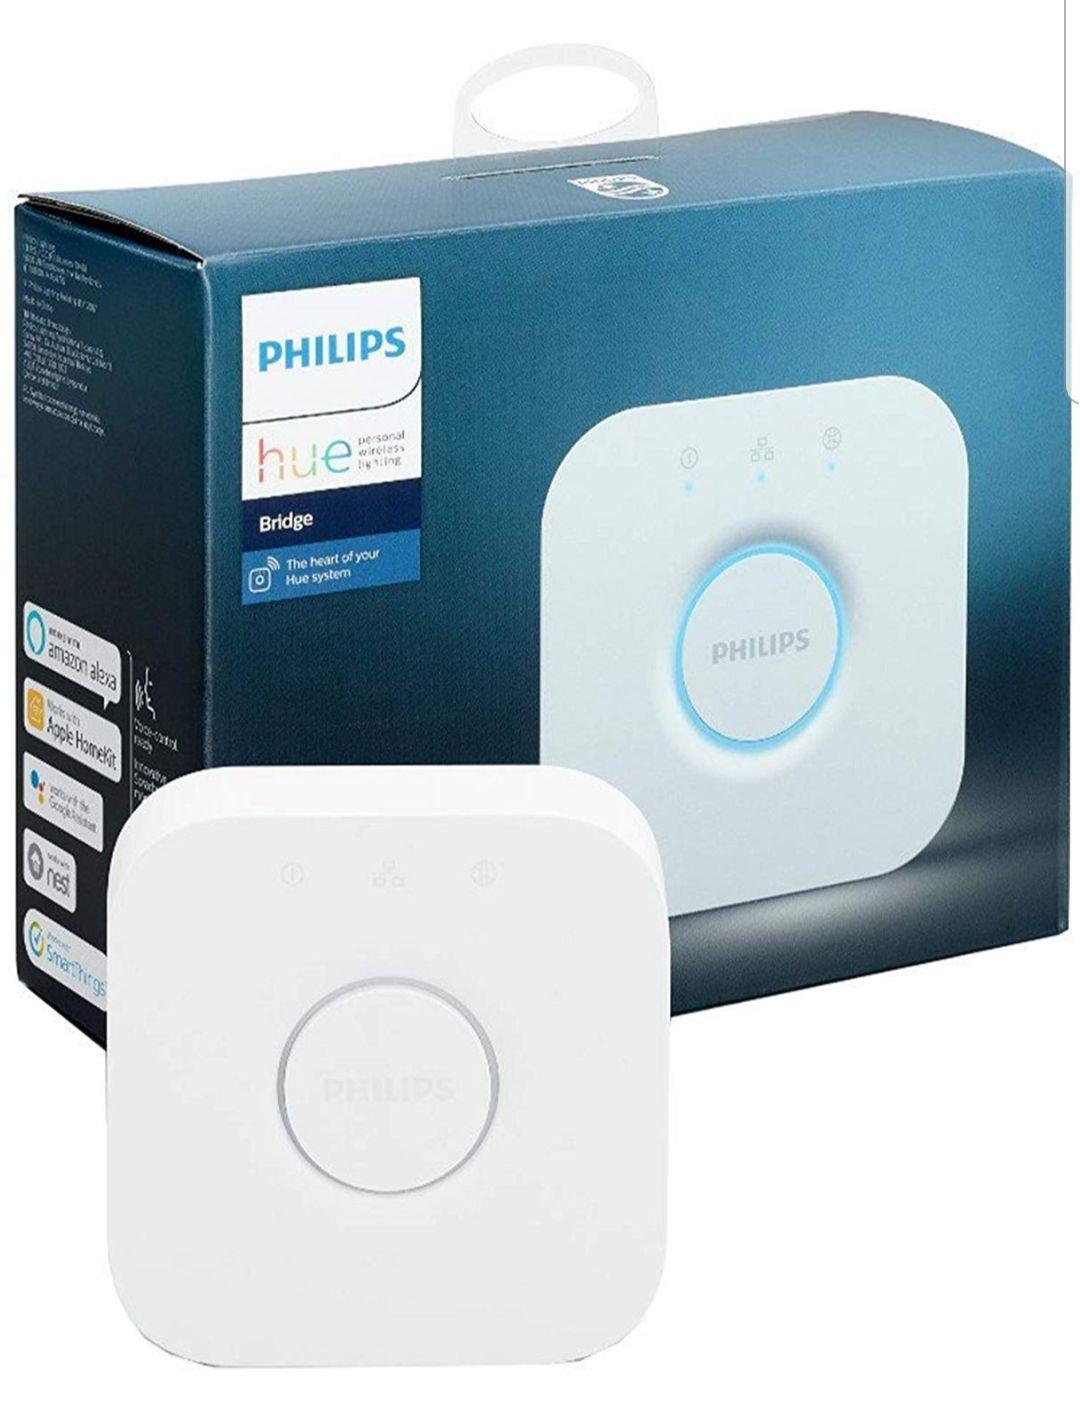 Philips Hue Bridge 2.0 £27.75 @ Amazon Prime Deal